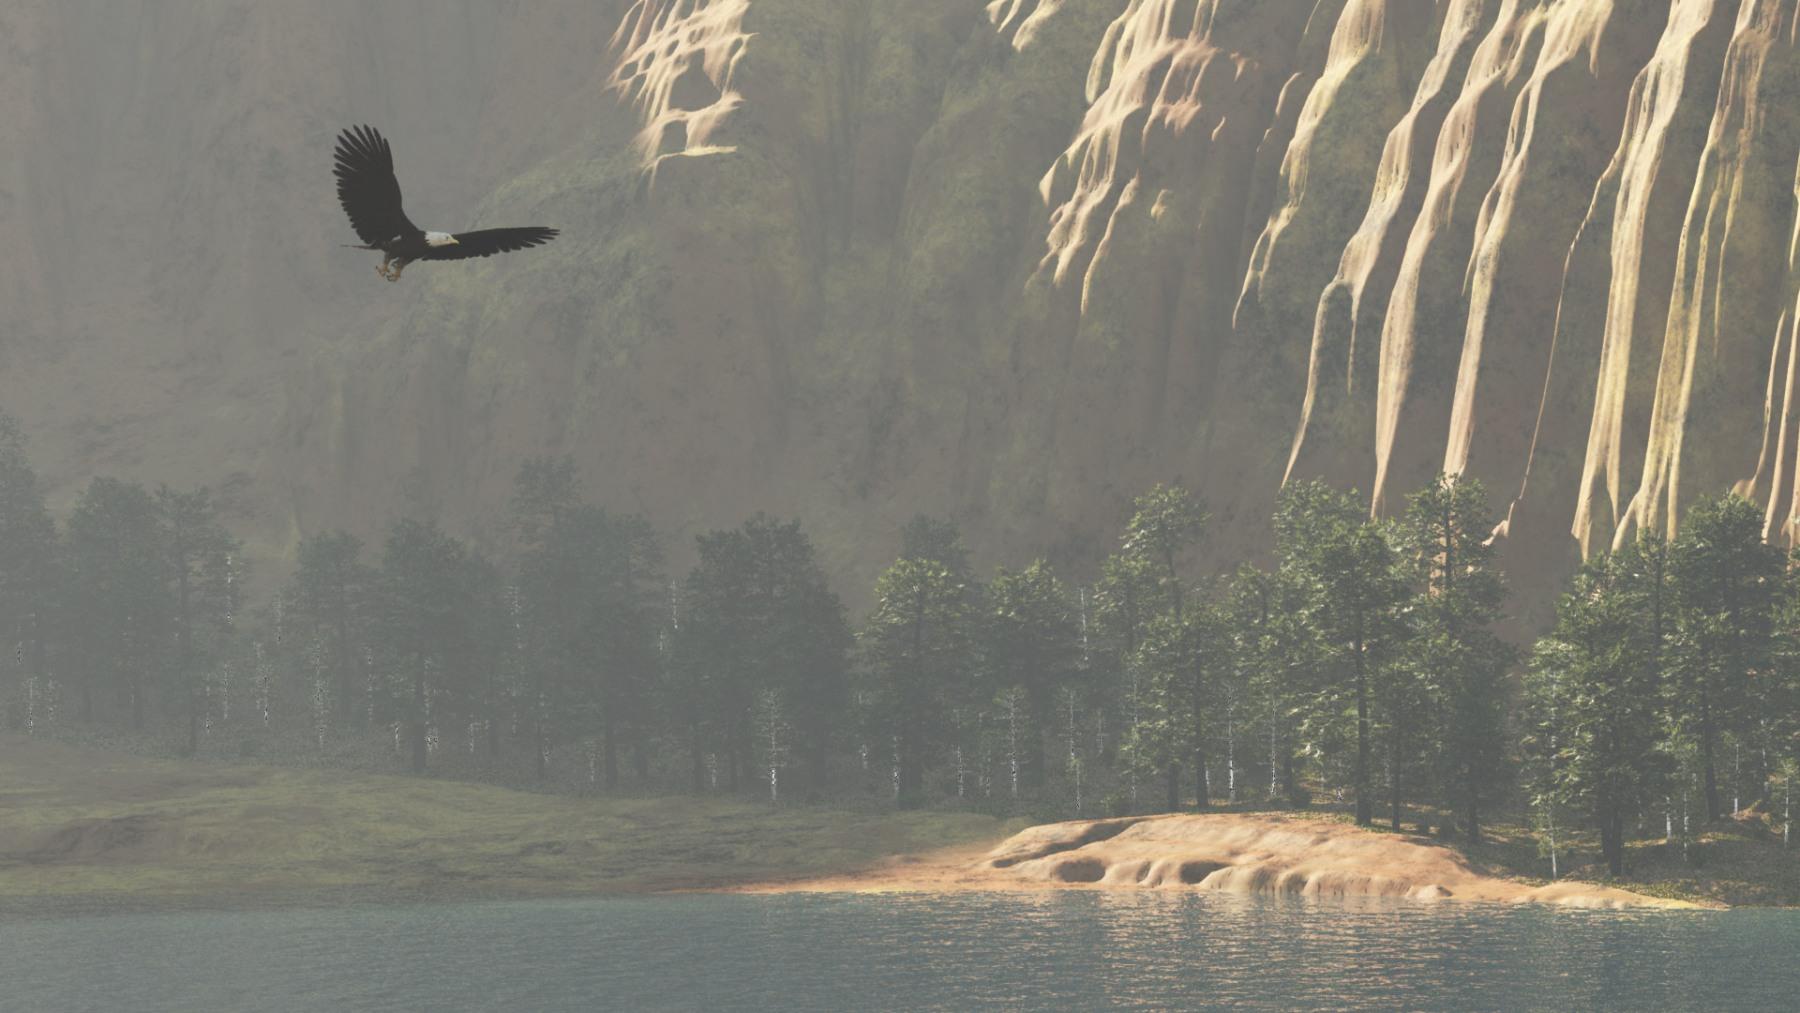 EAGLE (DETAIL)